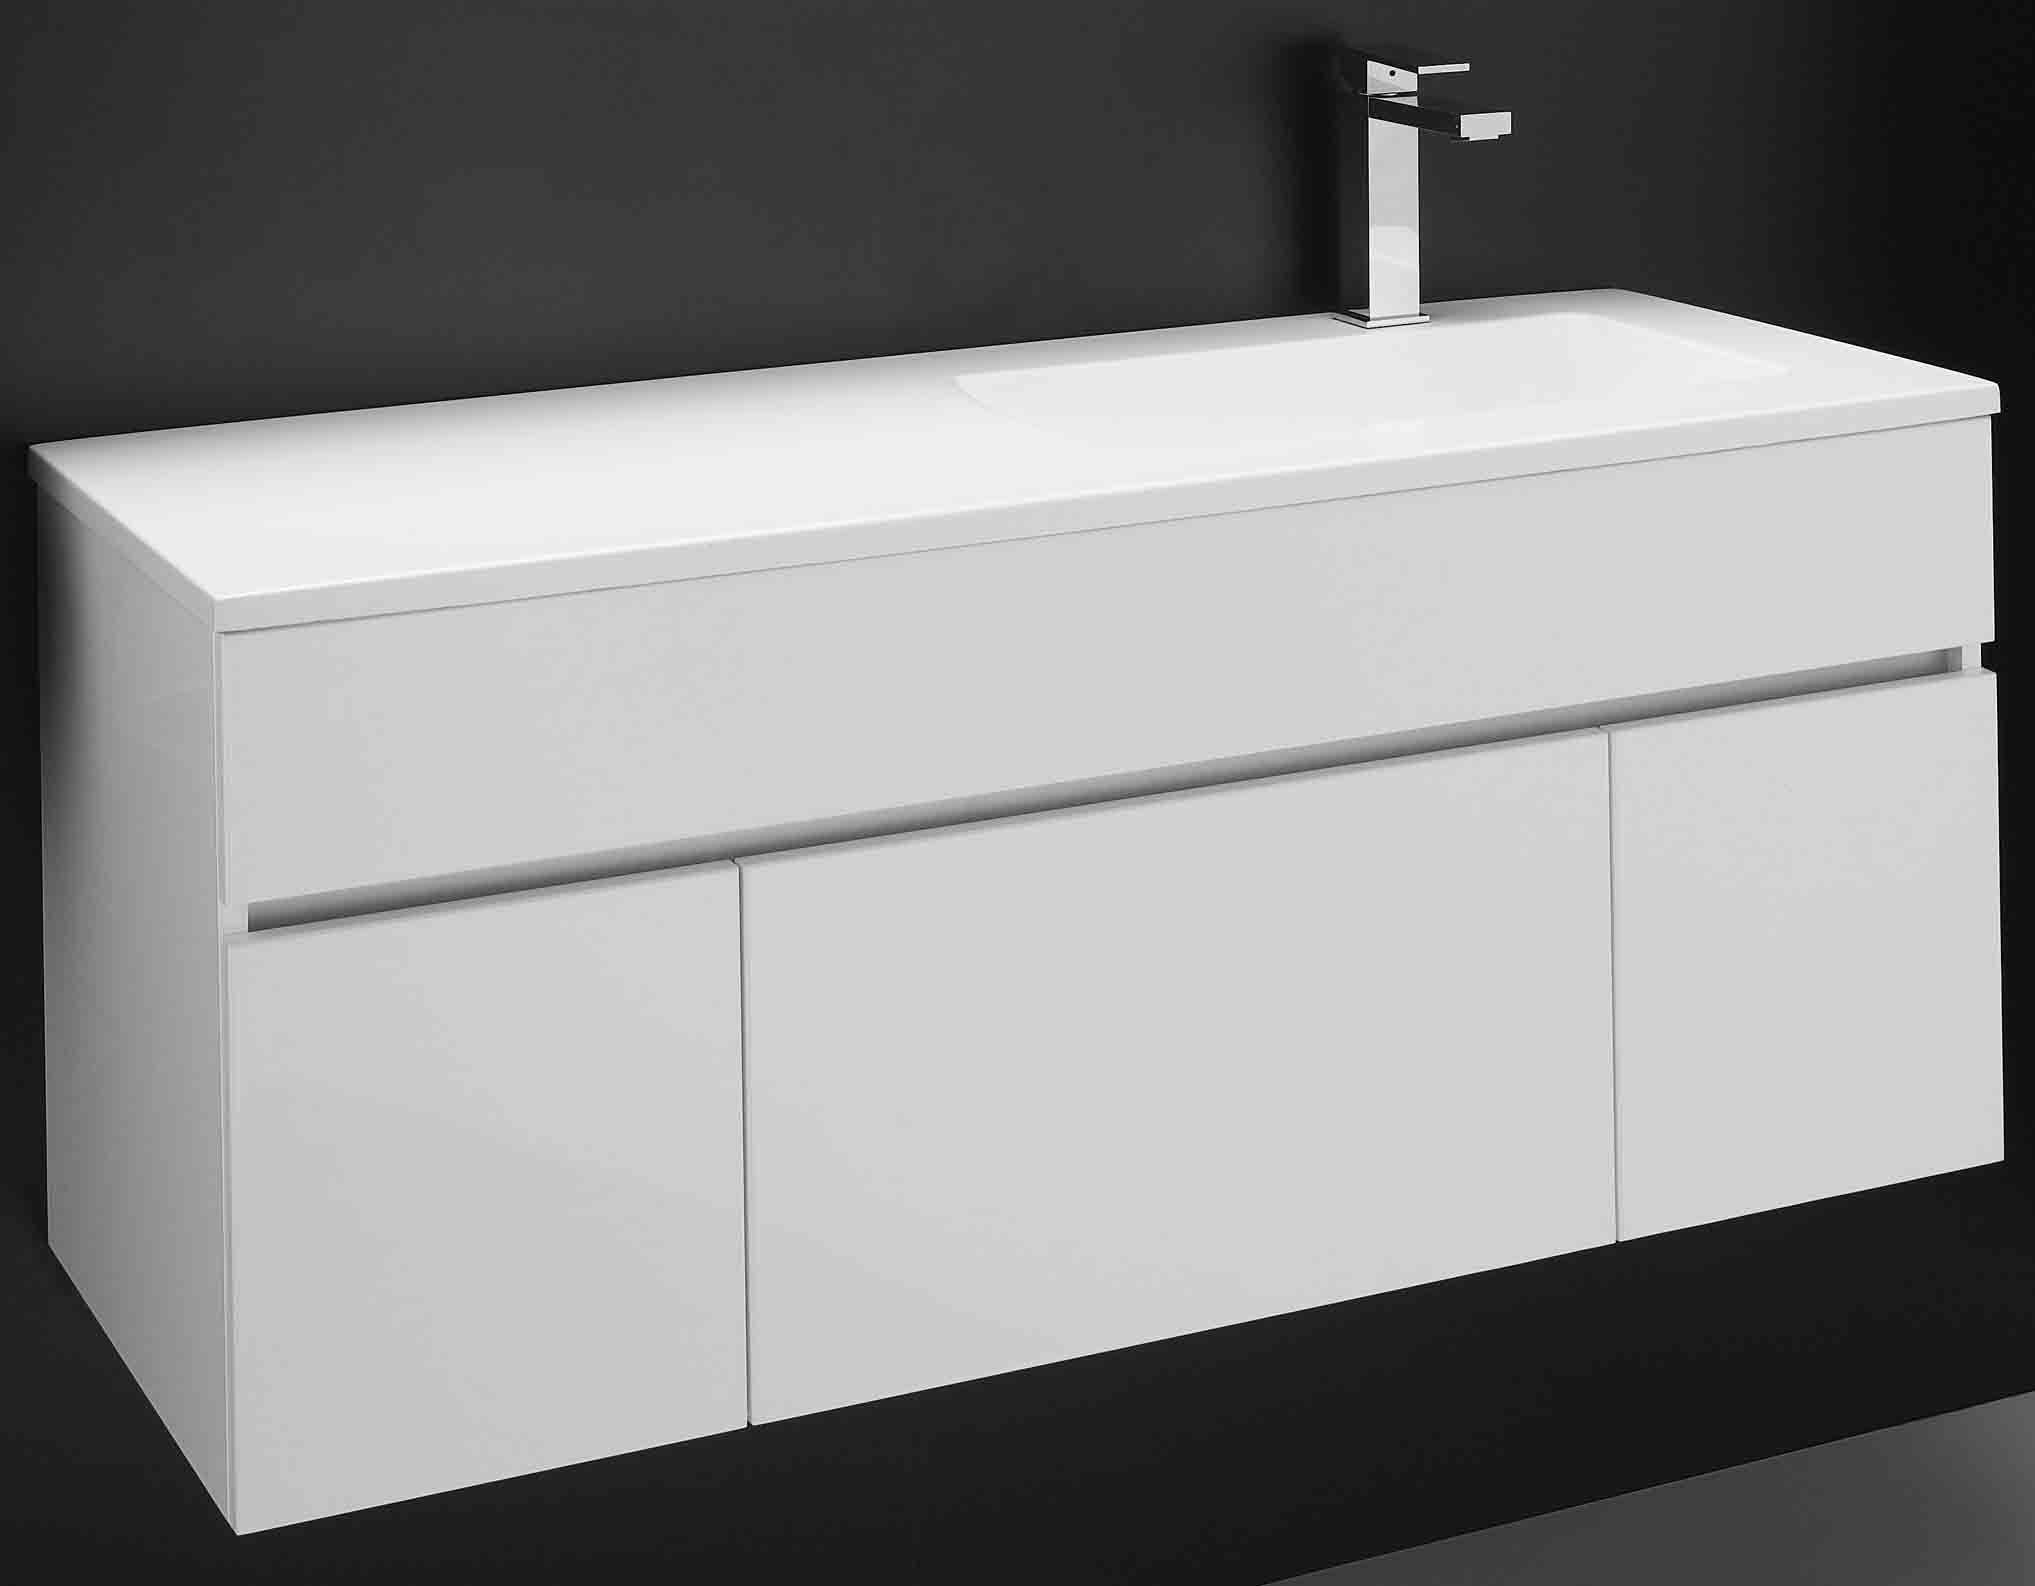 Bathroom vanity 1200 - Rifco Available At Reece Triniti Wall Hung Vanities